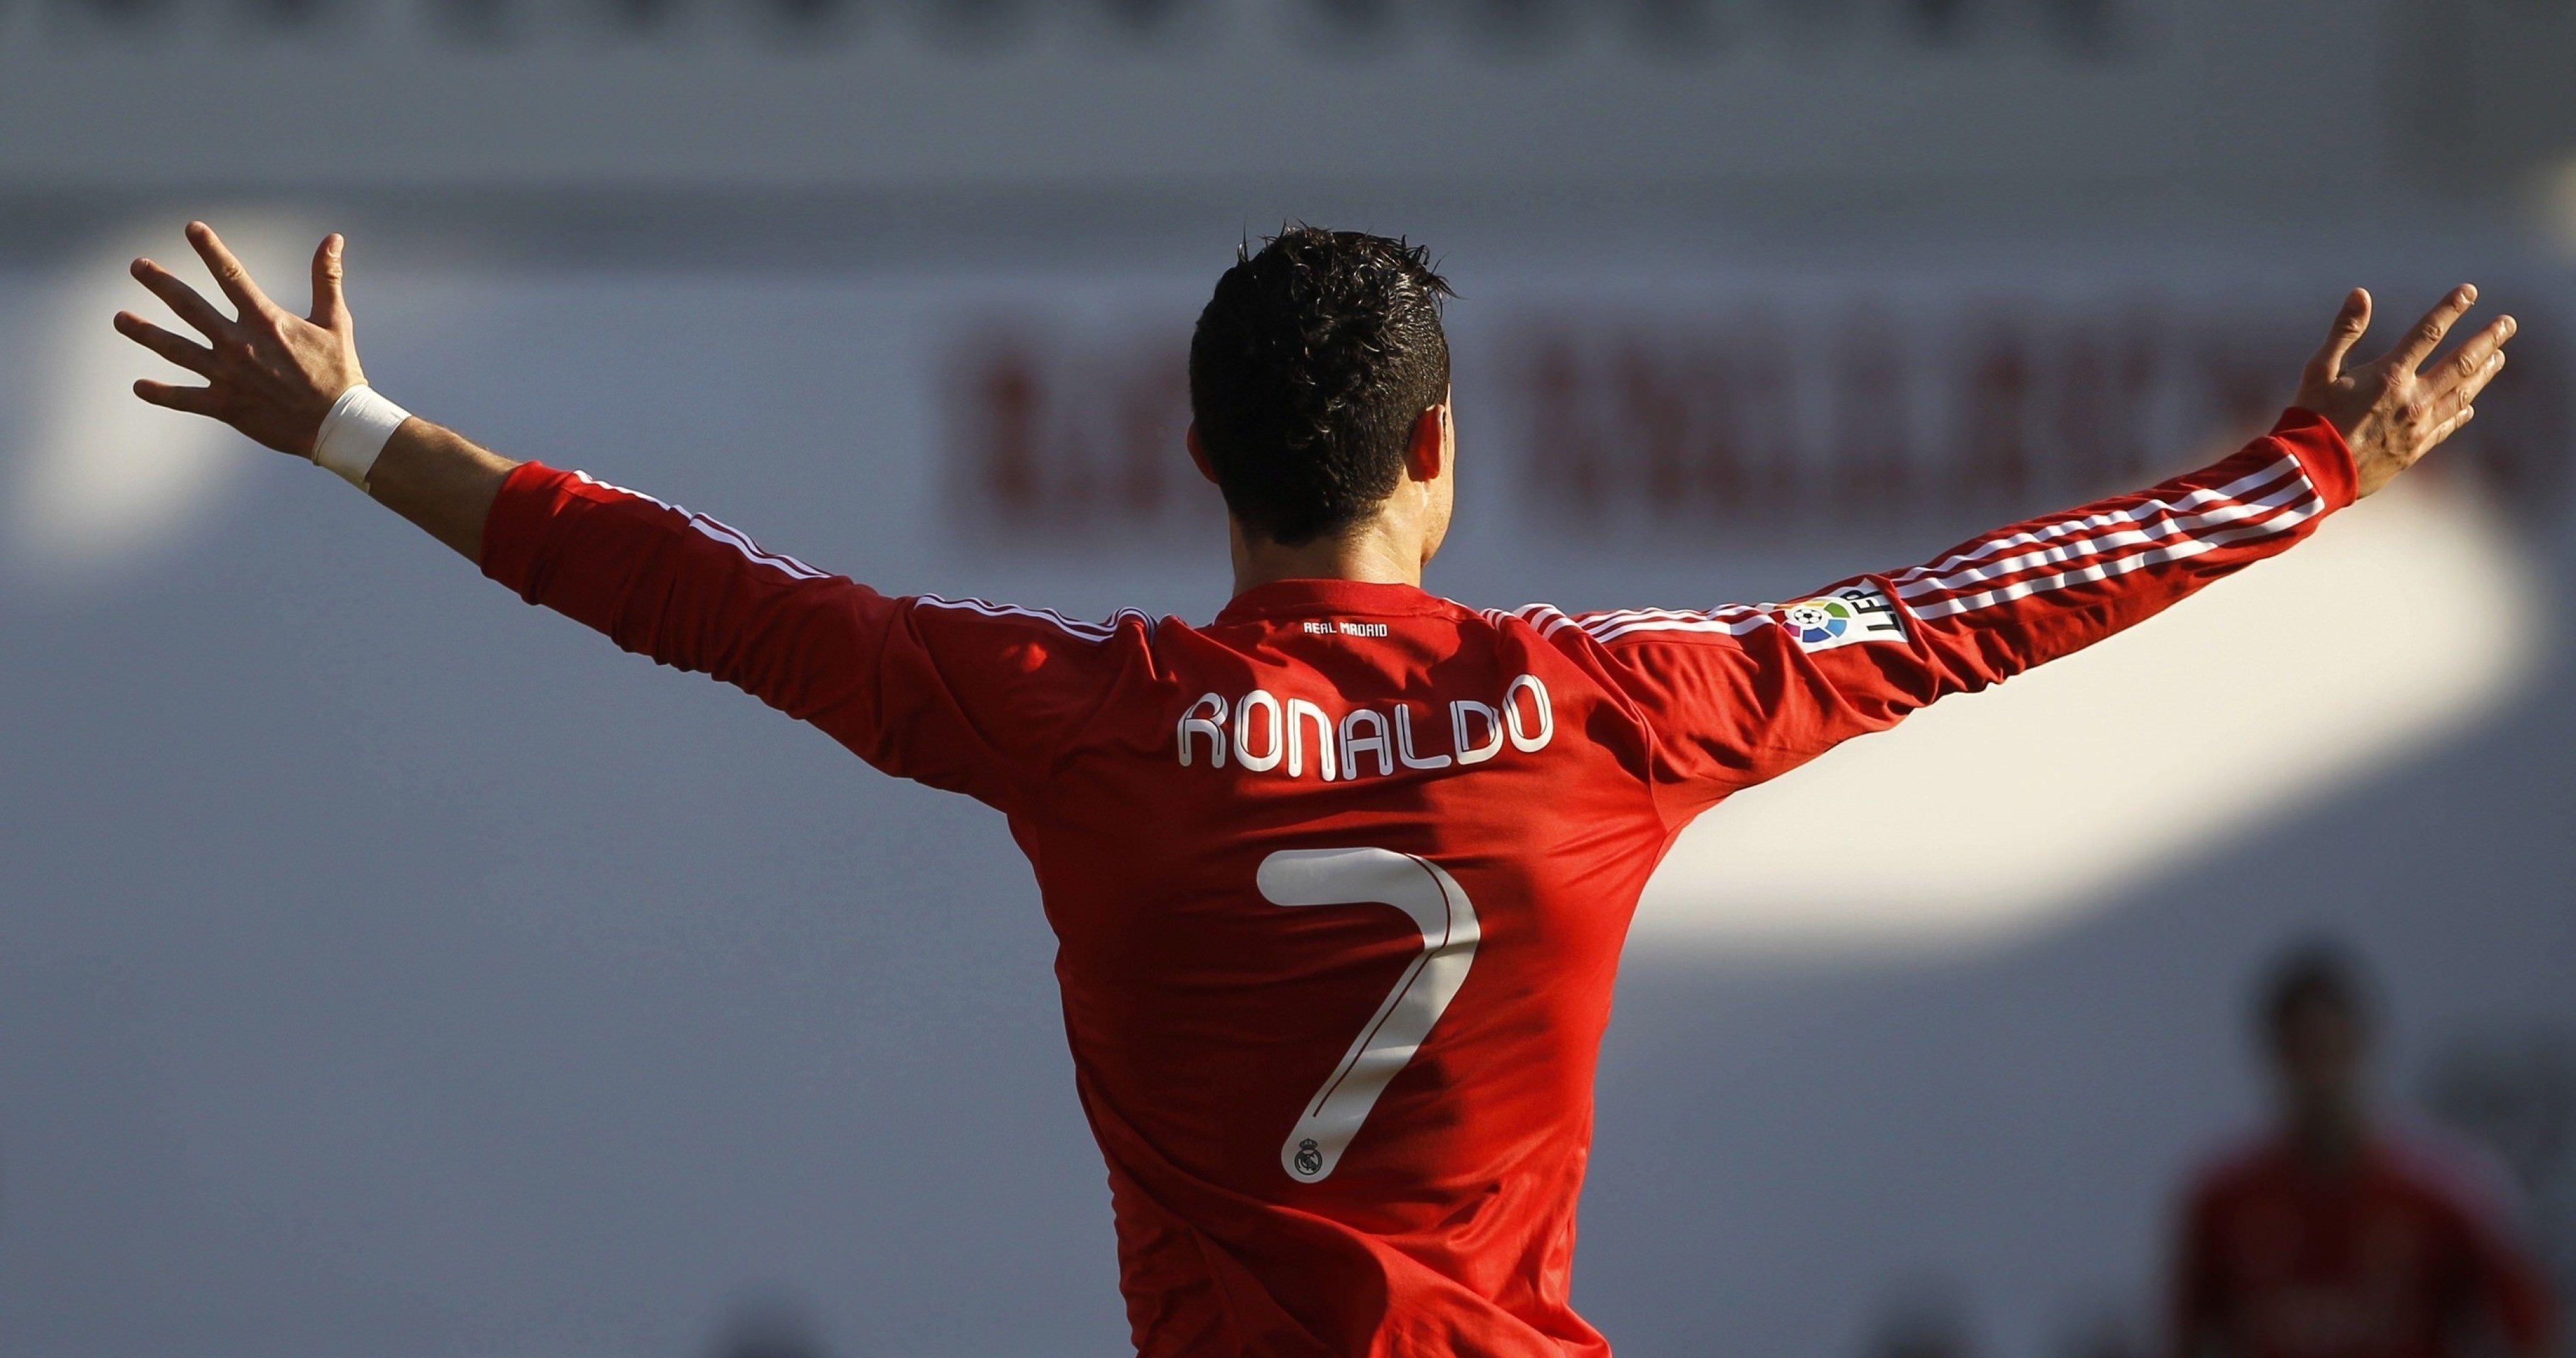 Cristiano Ronaldo Soccer Player 4k Ultra Hd Wallpaper Ololoshenka